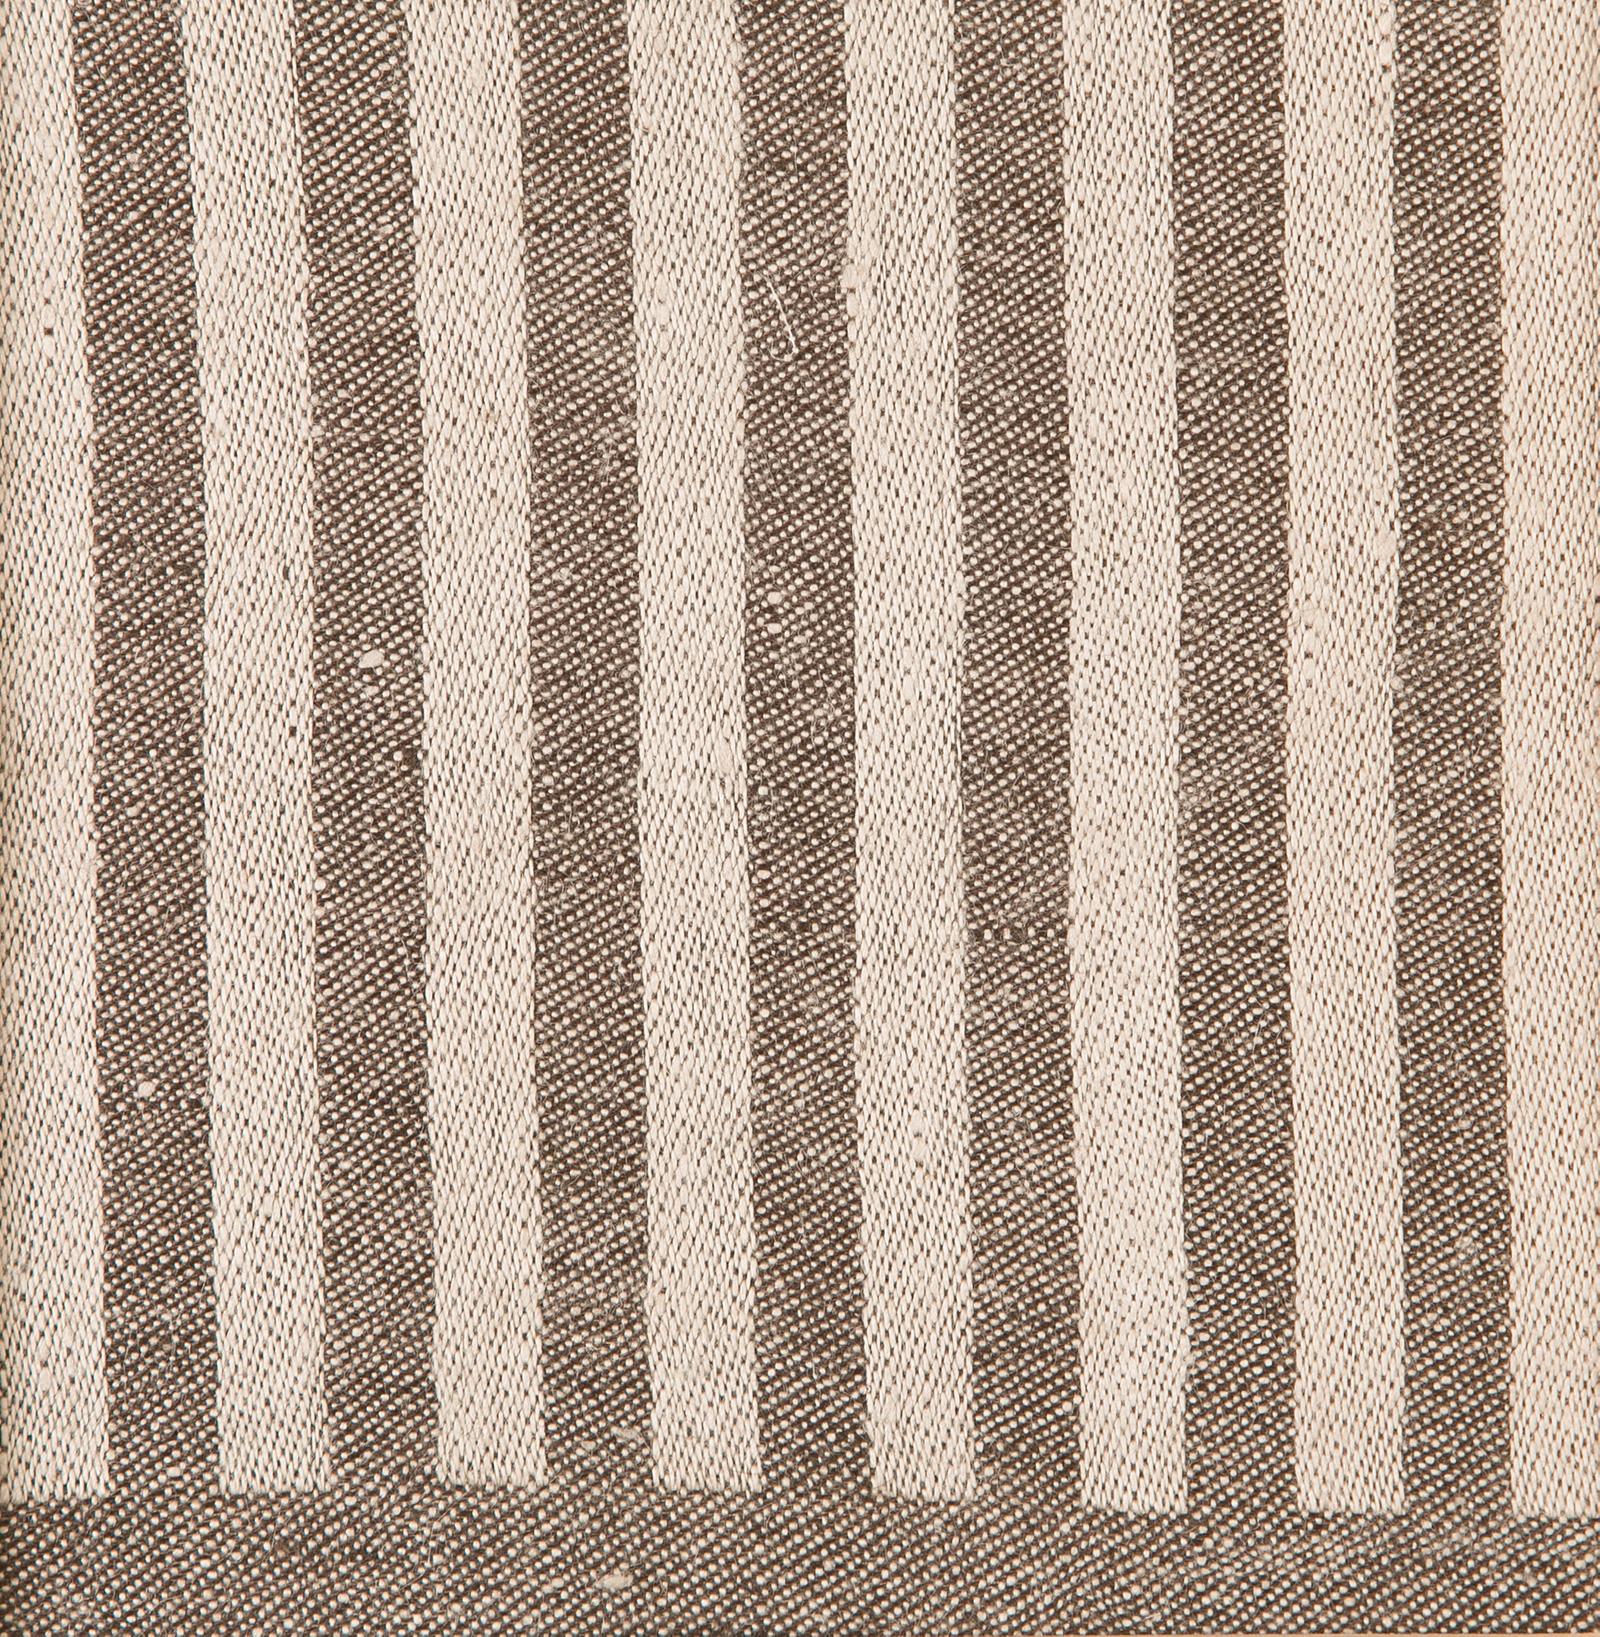 Anne bordslöpare färgprov design Hanne Vedel färg sandvarp chokladbrun